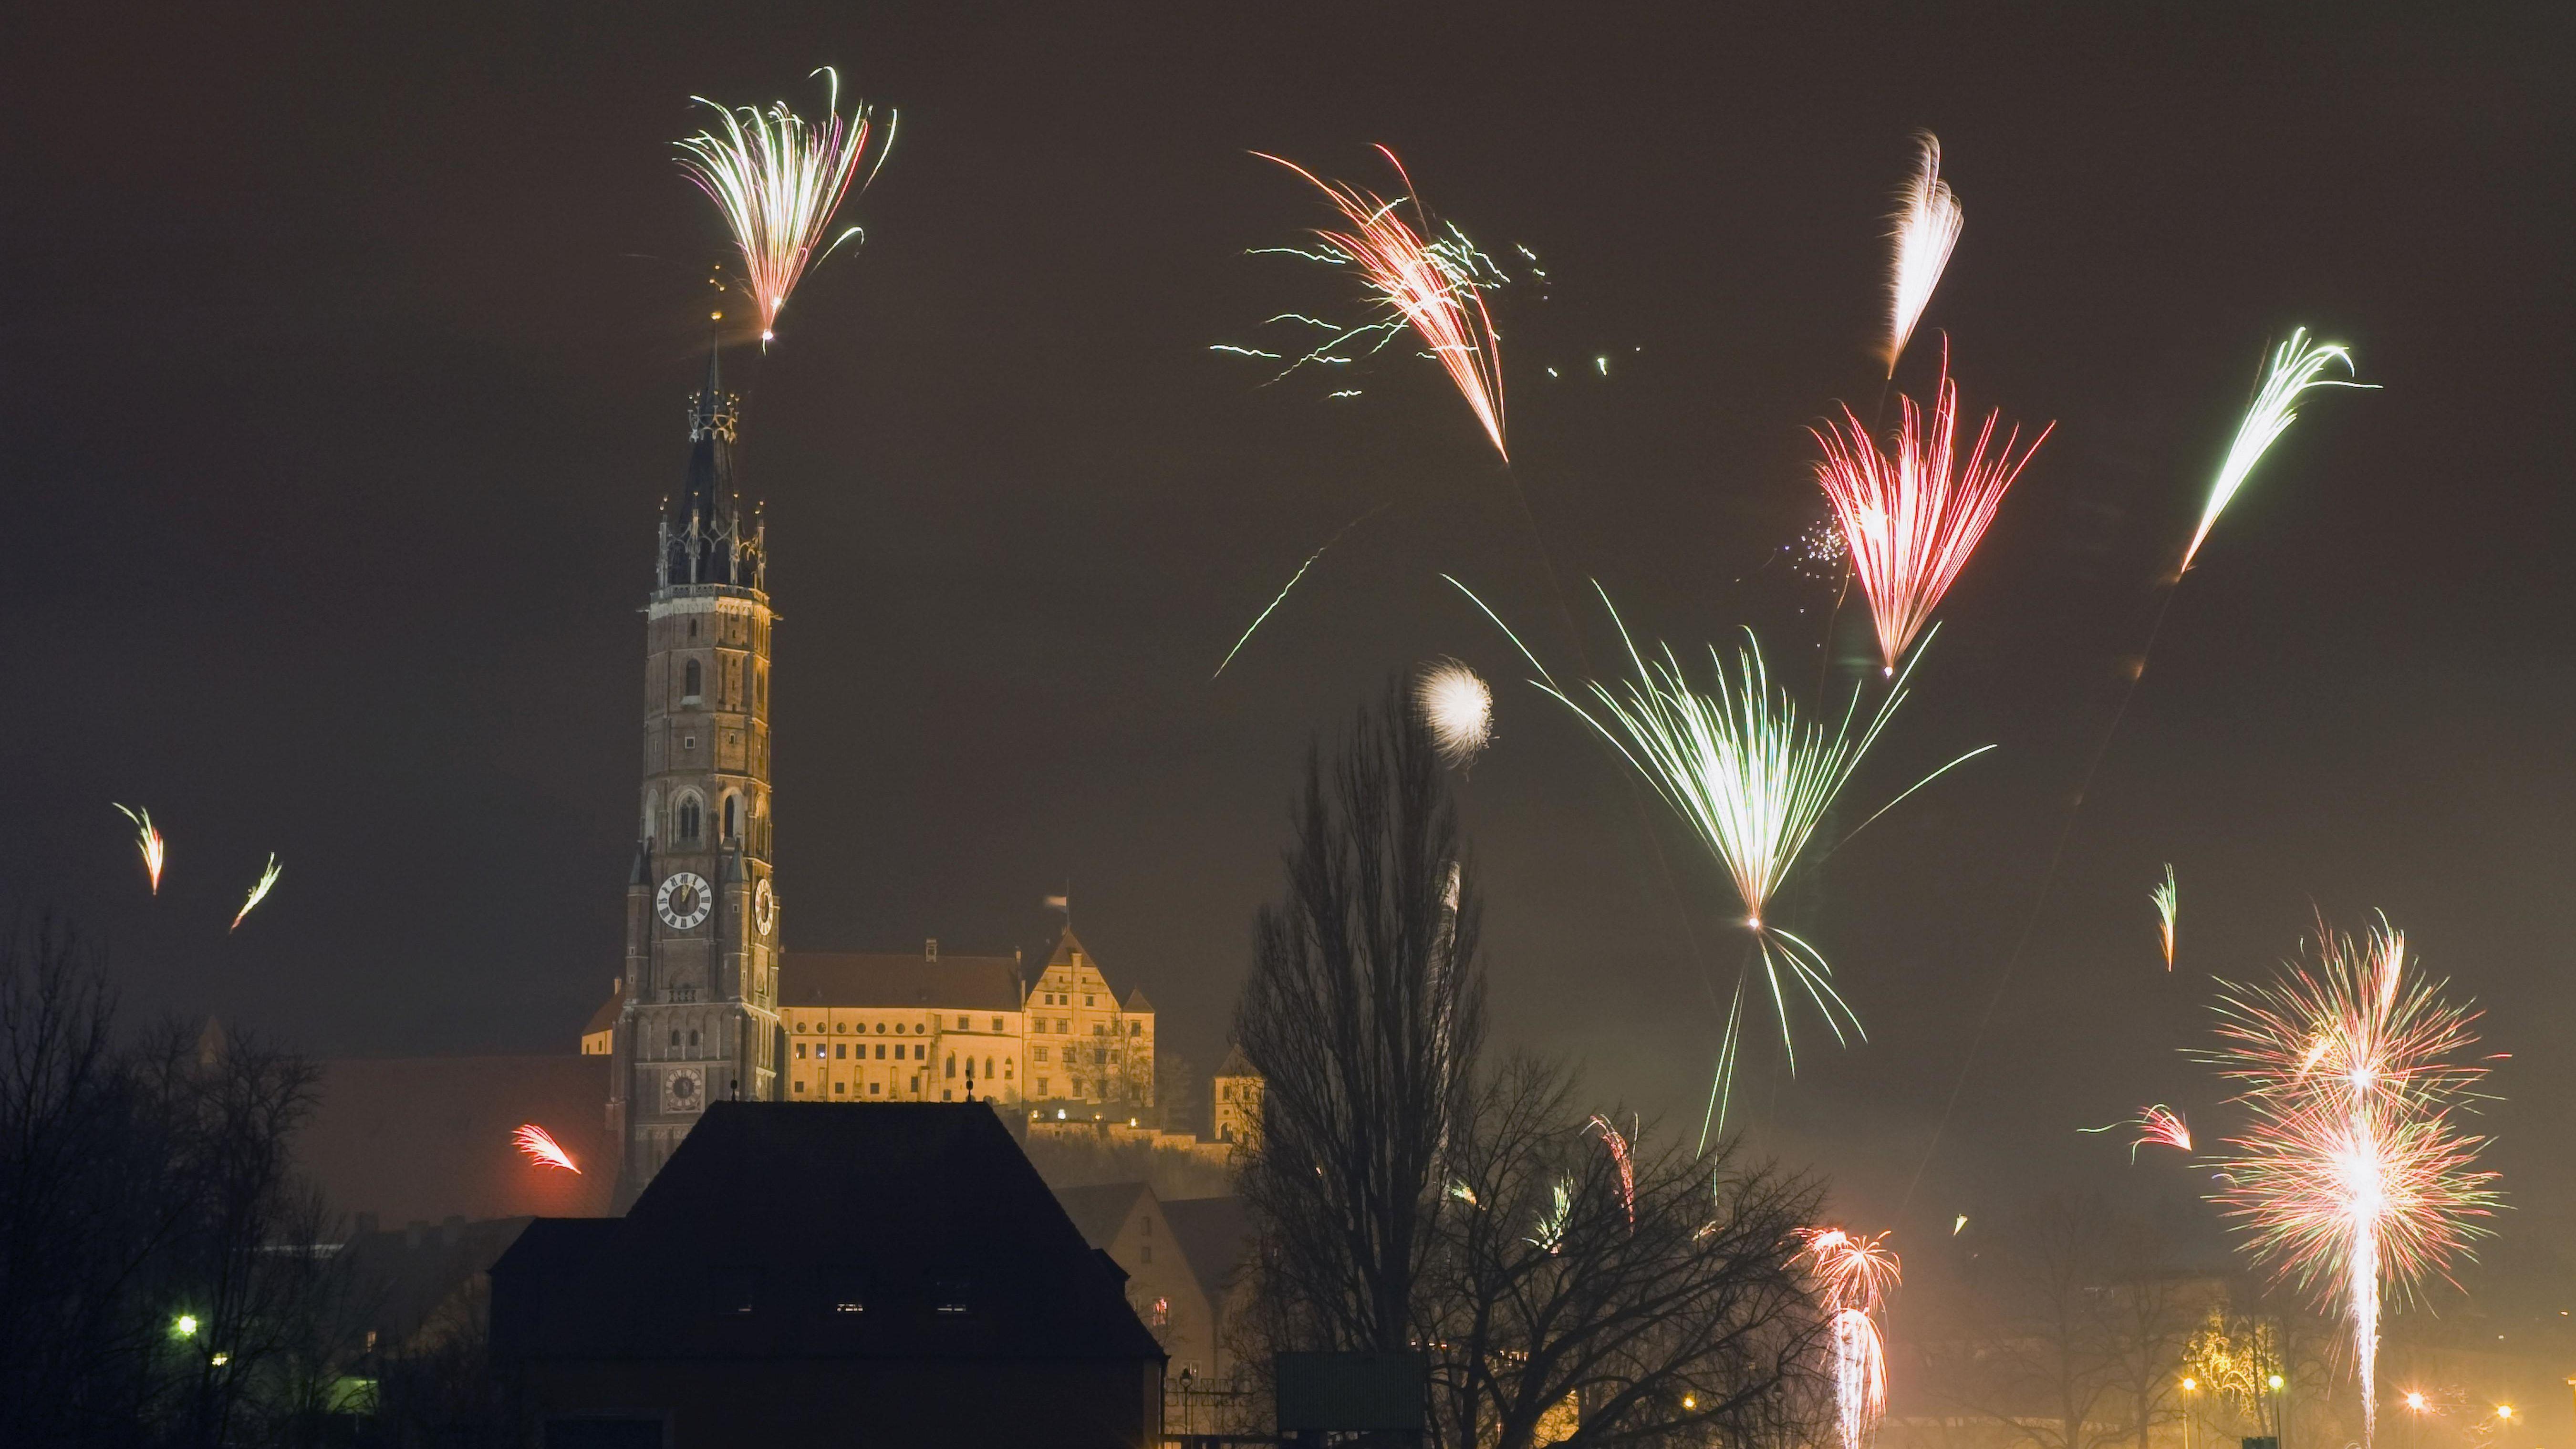 Feuerwerk über der Landshuter Altstadt